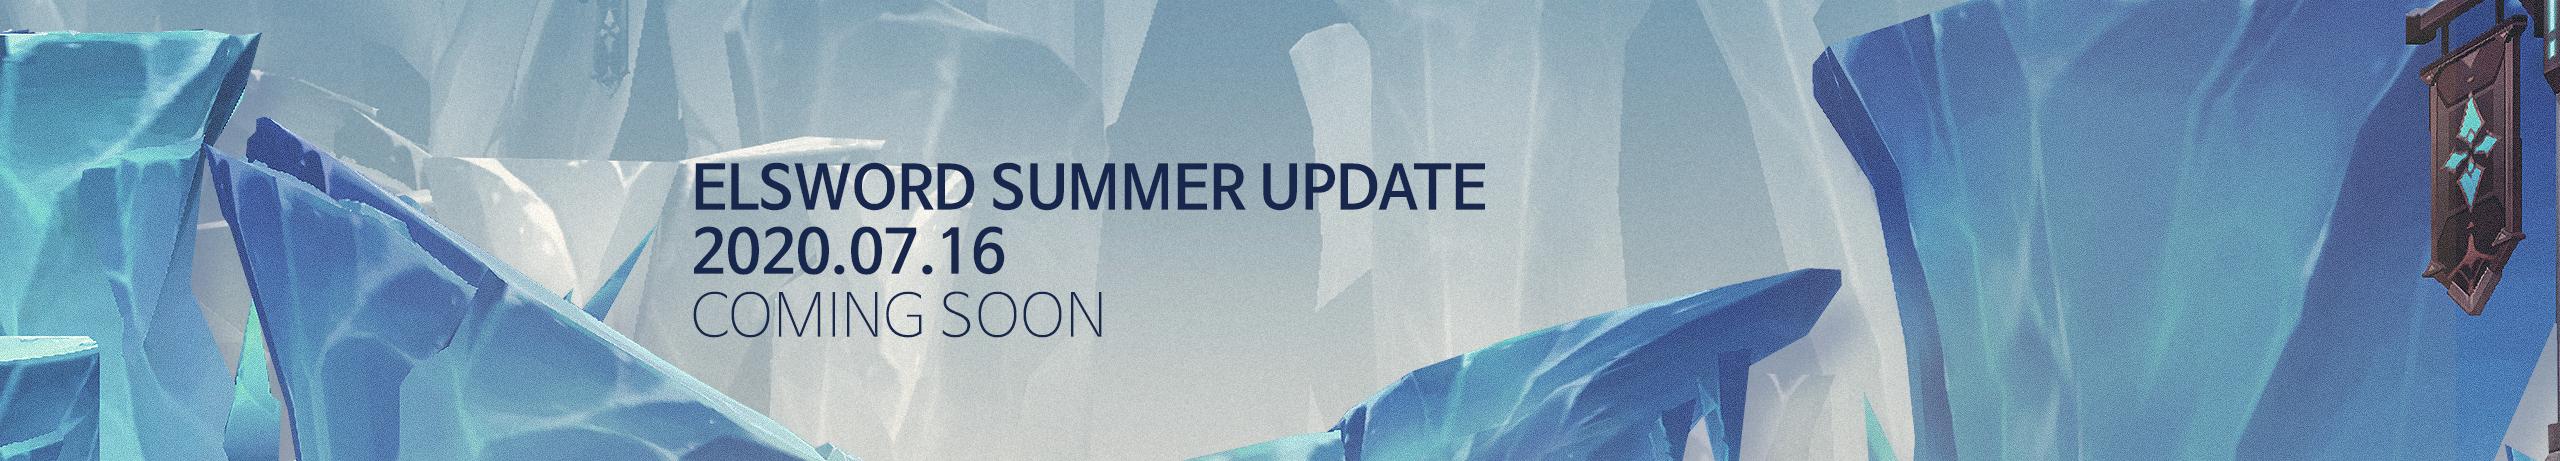 2020 SUMMER UPDATE